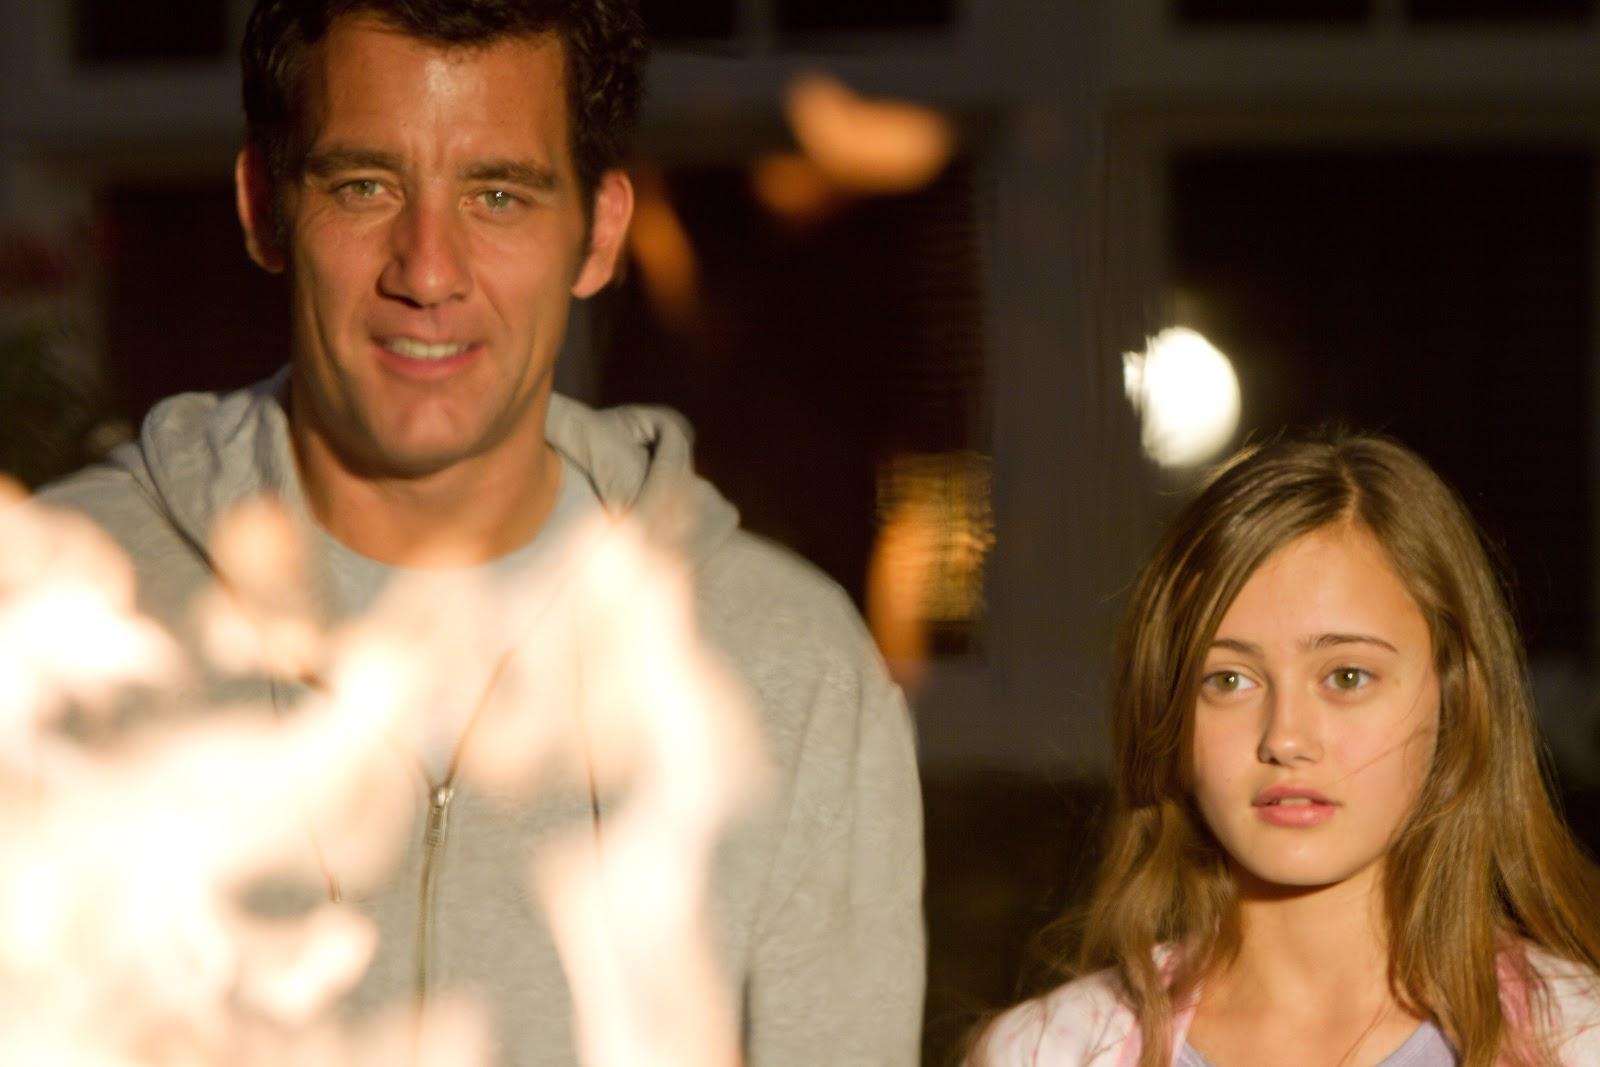 http://4.bp.blogspot.com/-fQyp8S0O7uI/UIfVrbKnoAI/AAAAAAAABpM/SqTz9-Lt504/s1600/intruders-movie-image-clive-owen-03.jpg